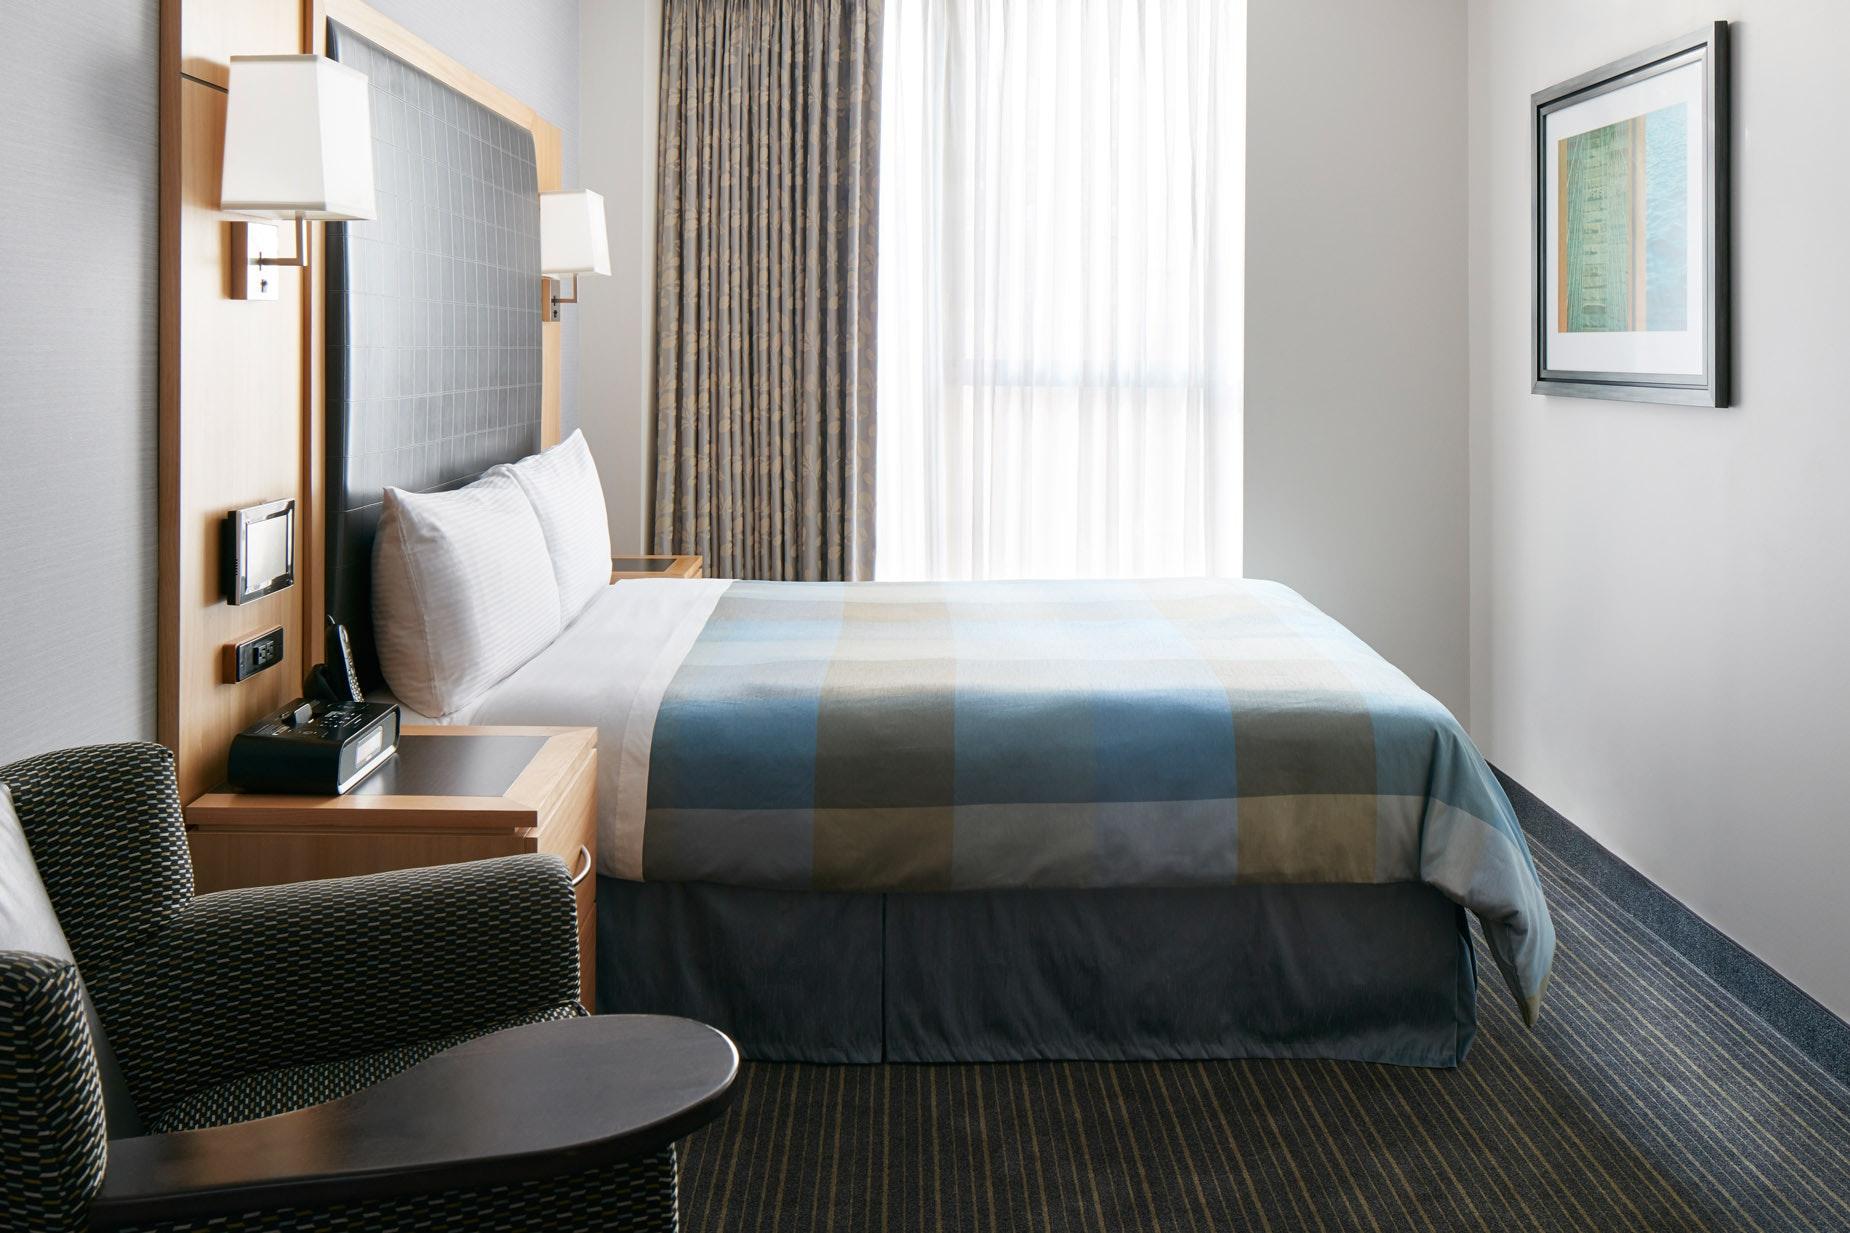 Standard Room Club Quarters Hotel World Trade